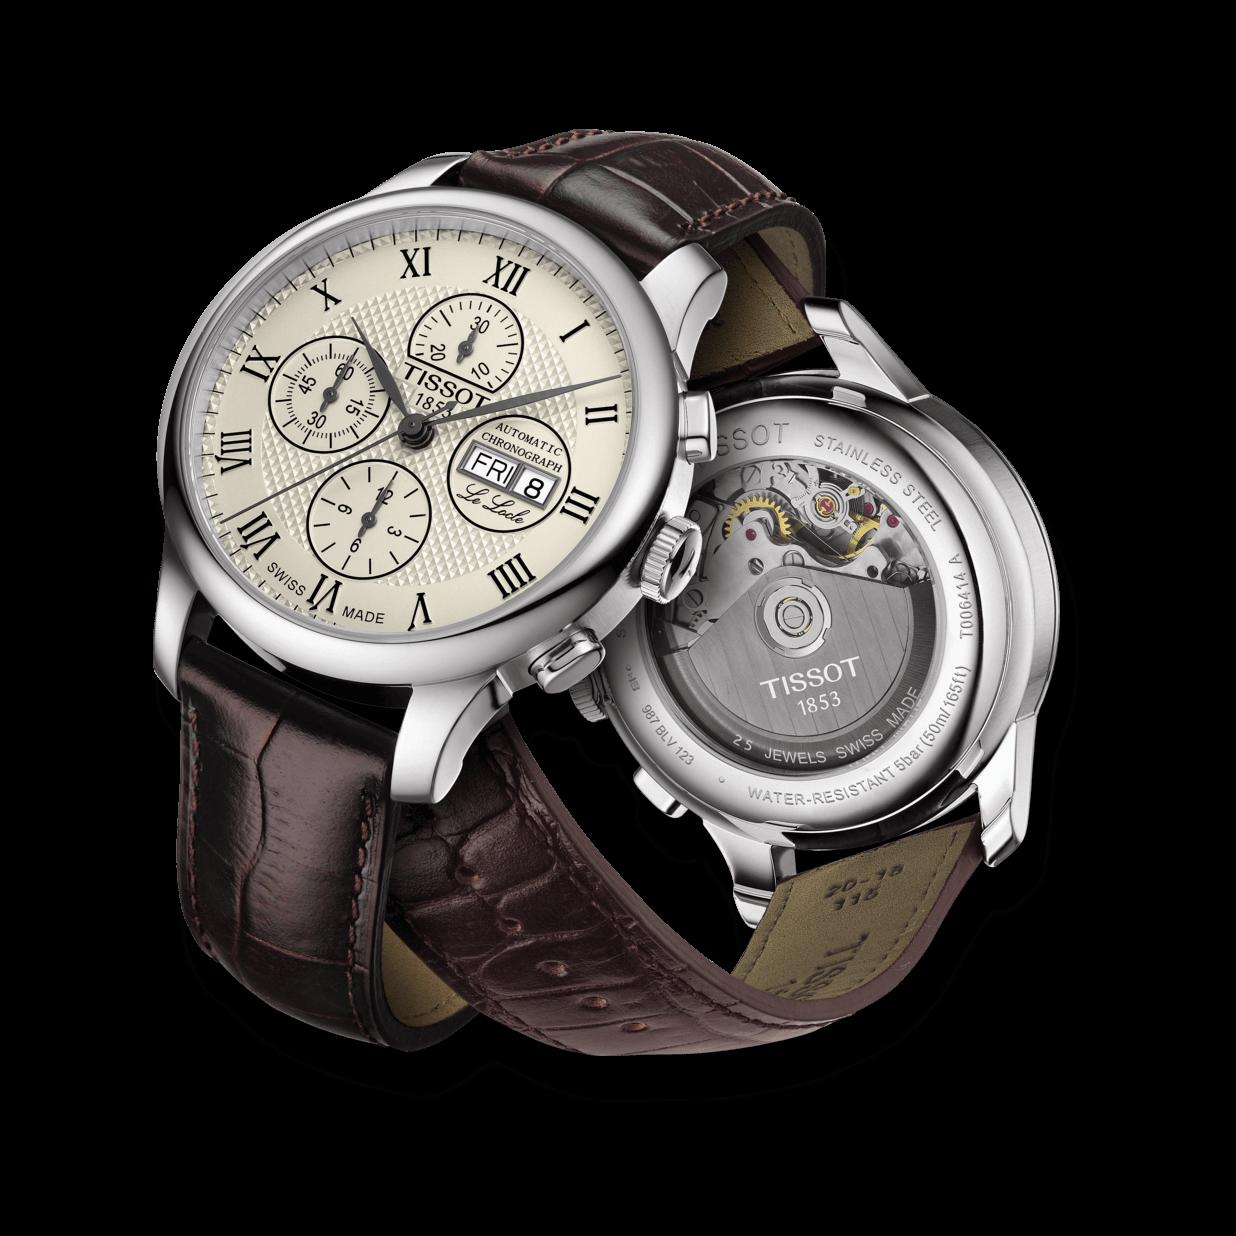 Chronograph Kaufen Le Locle Valjoux Uhren Automatic Tissot kXZuPOi